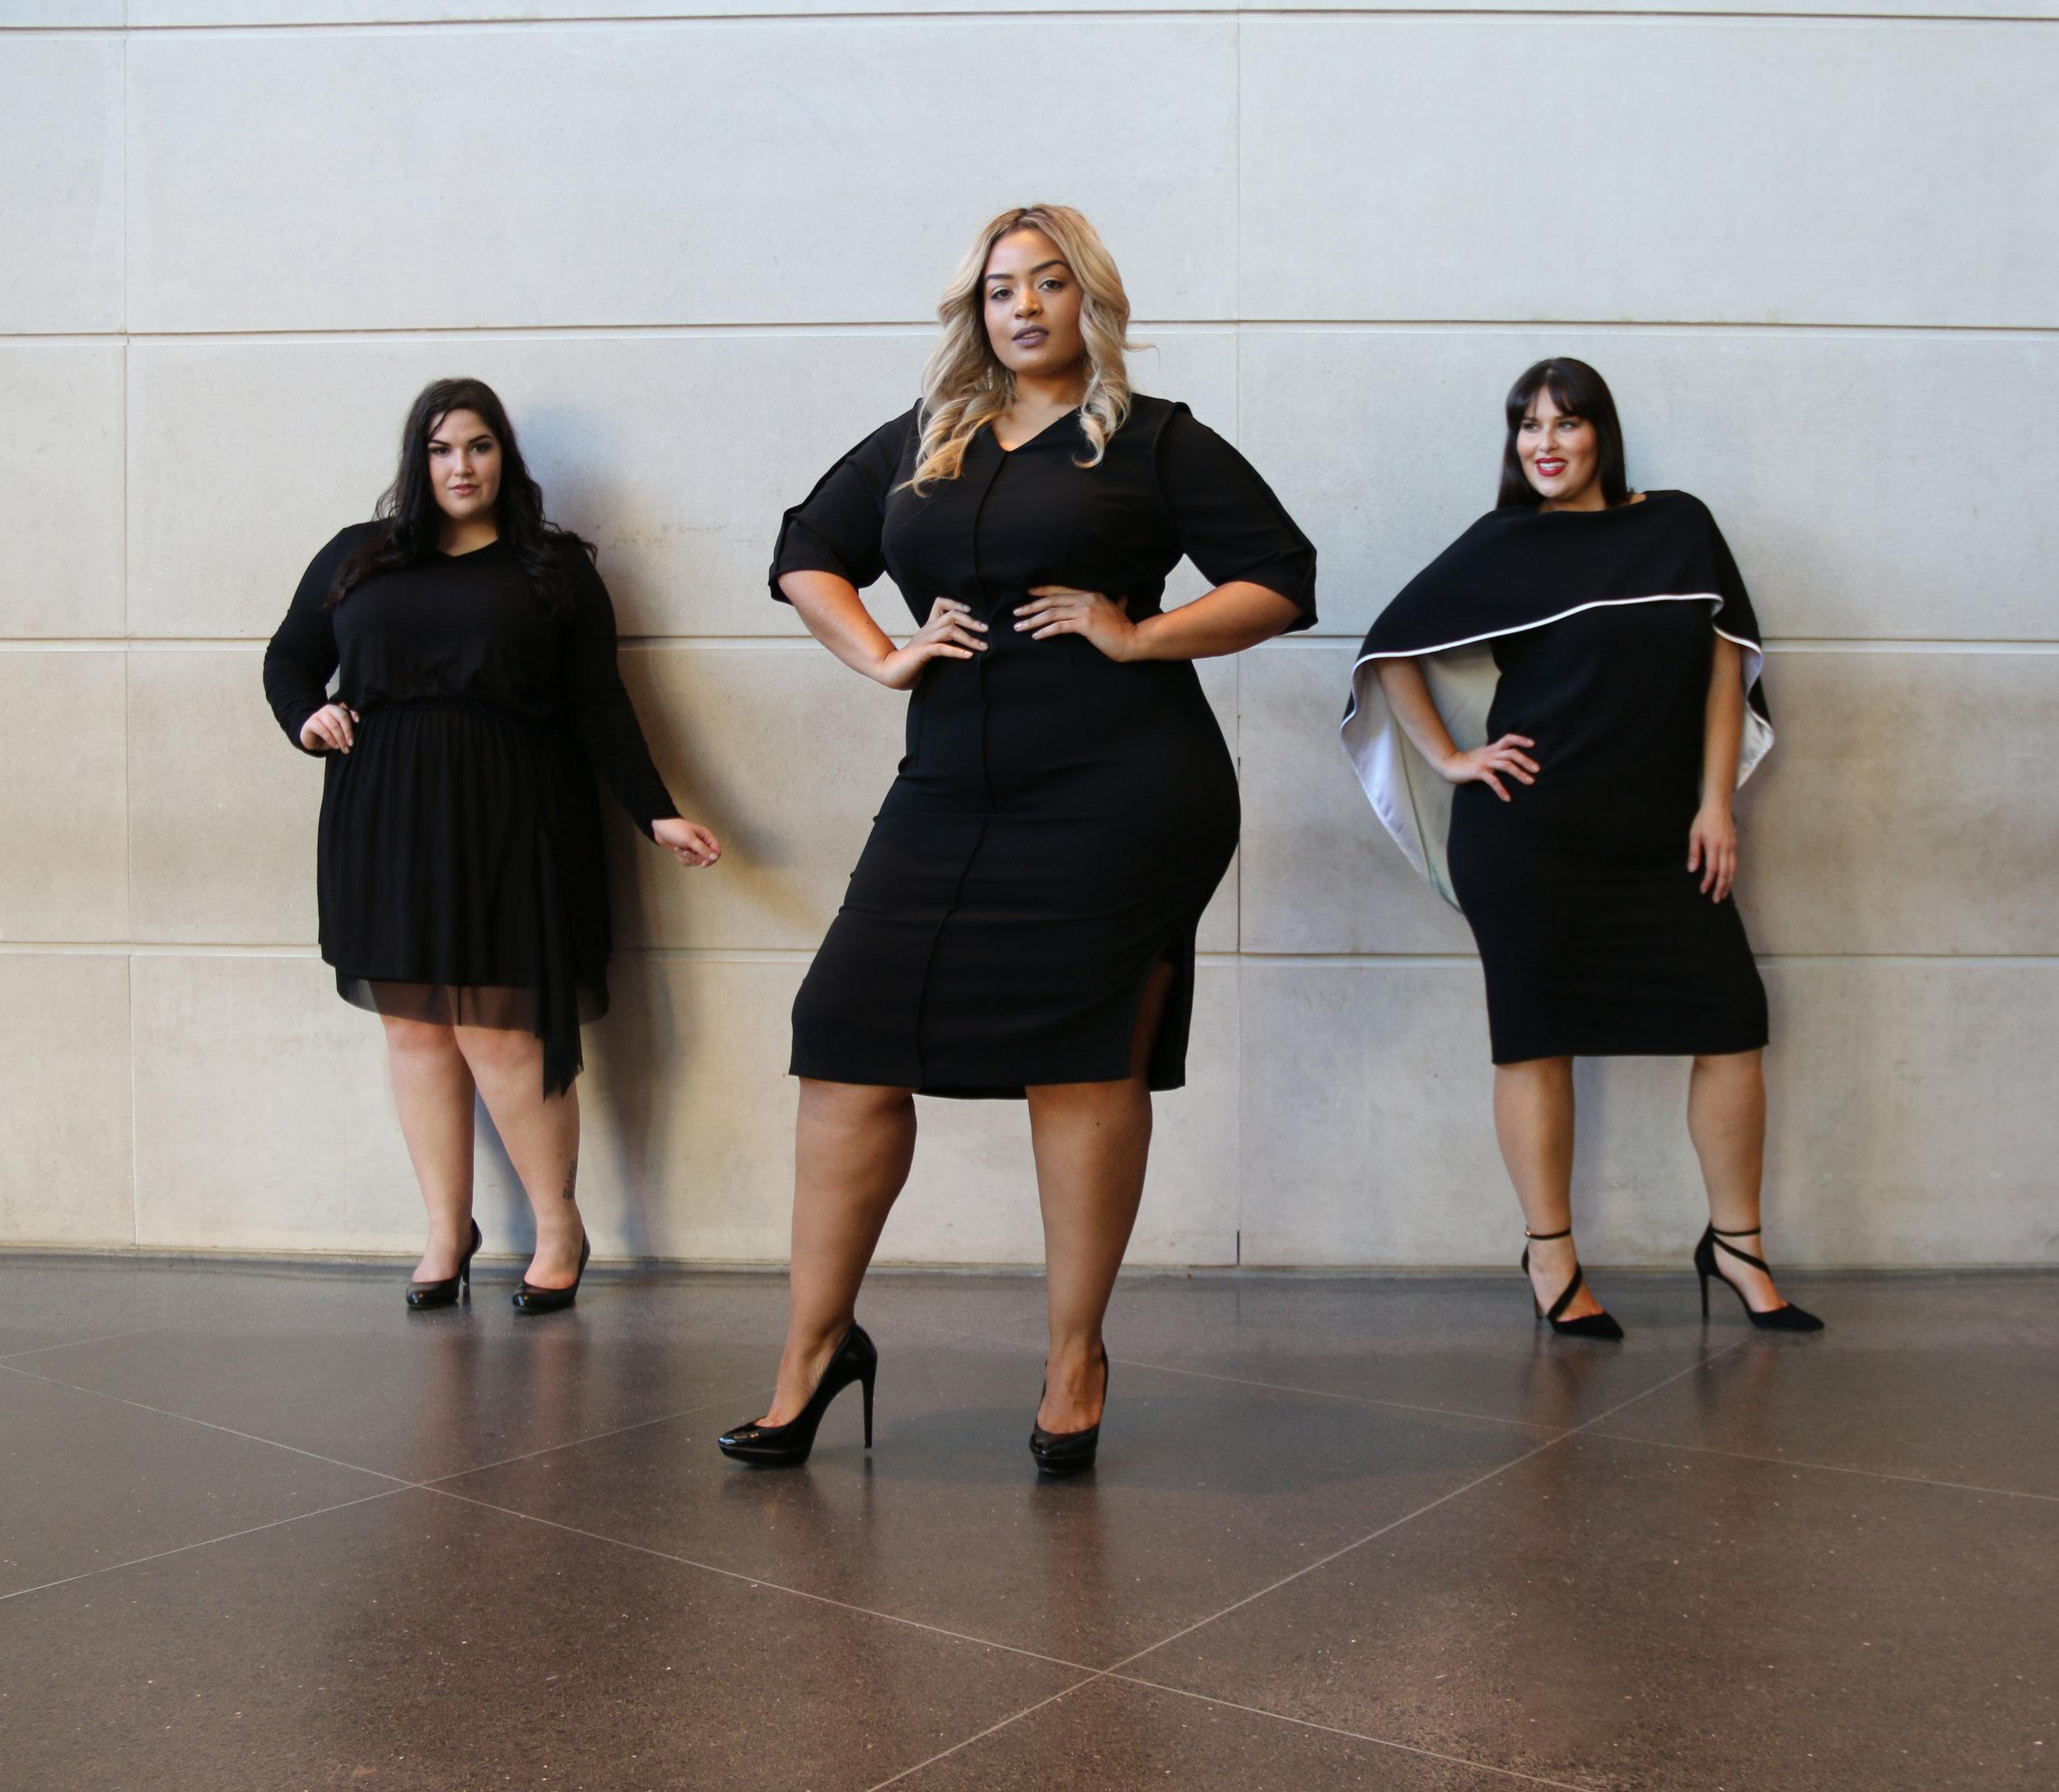 Models  (left to right): Faith Costa, Desiree Jenkins, Rebecca Ballister  Photo :Nancy Anteby